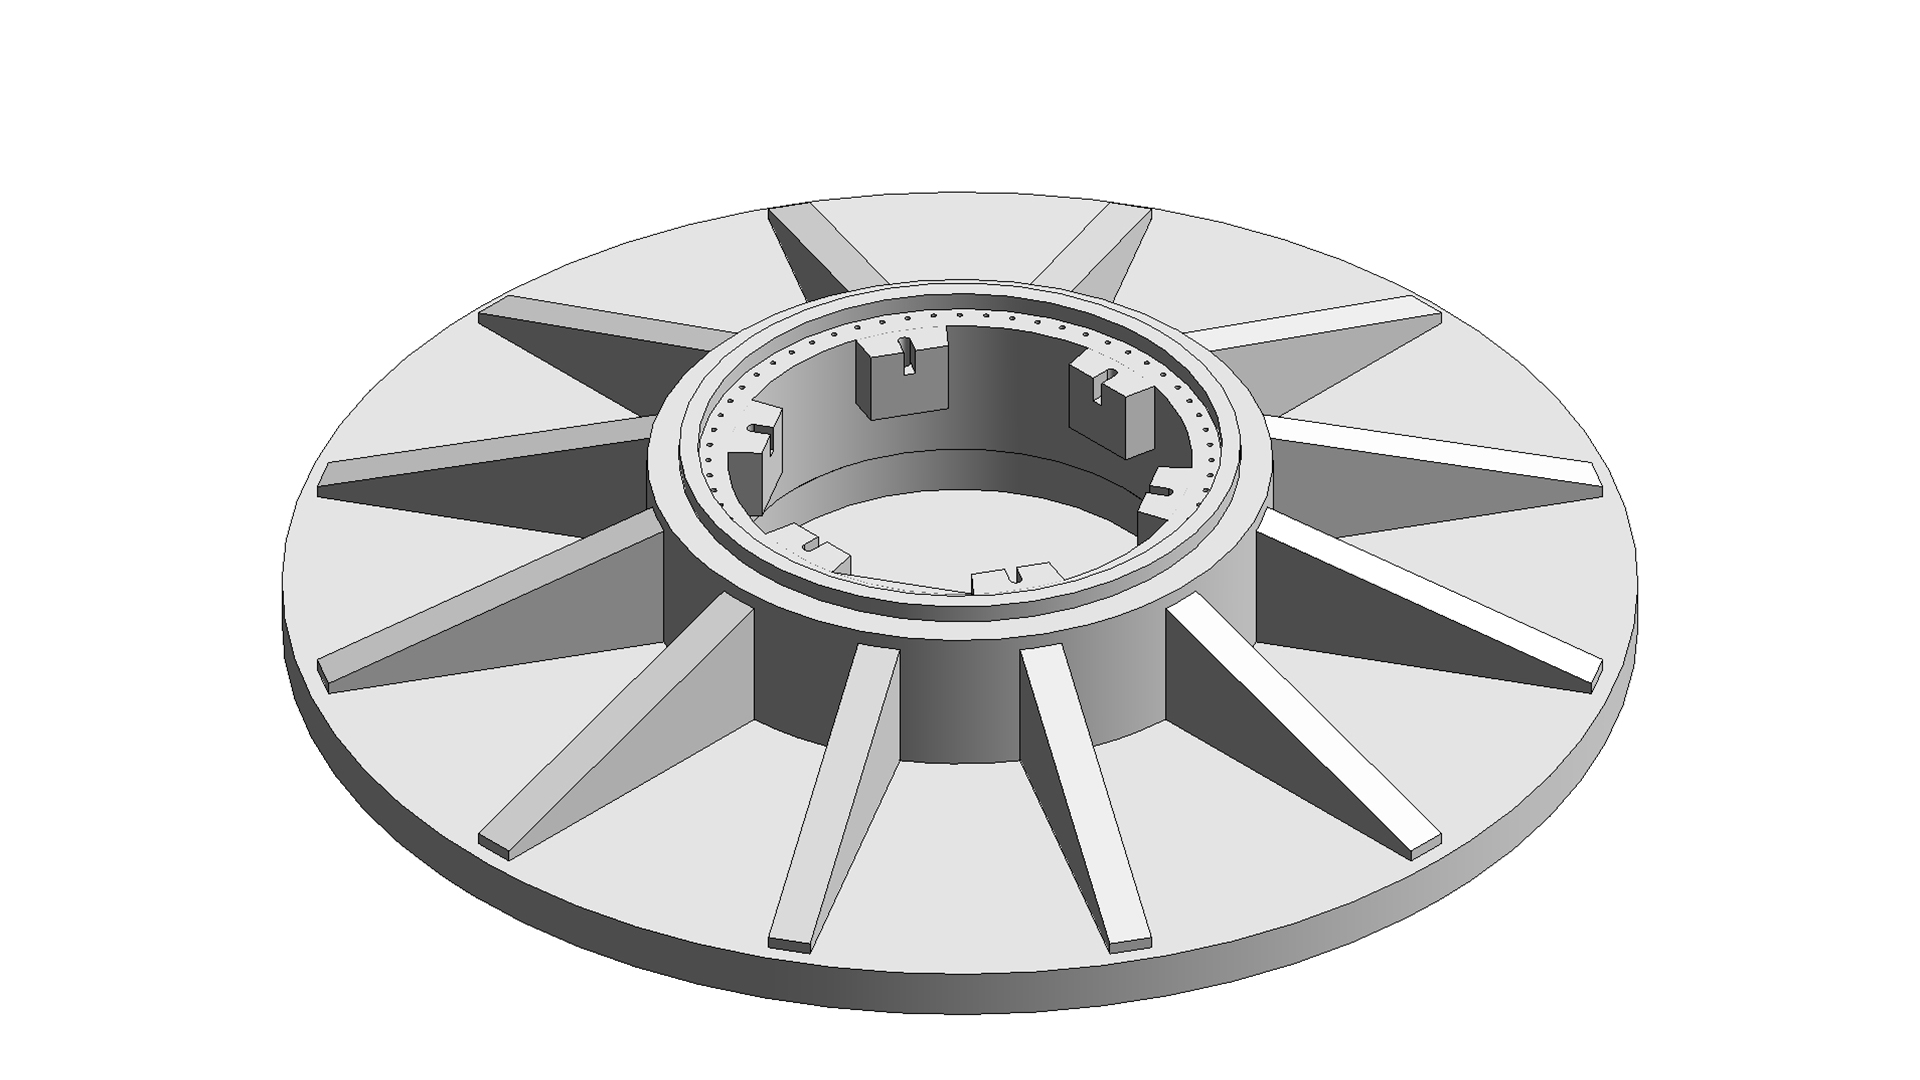 Cimentacion Aerogeneradores A13-presentacion2